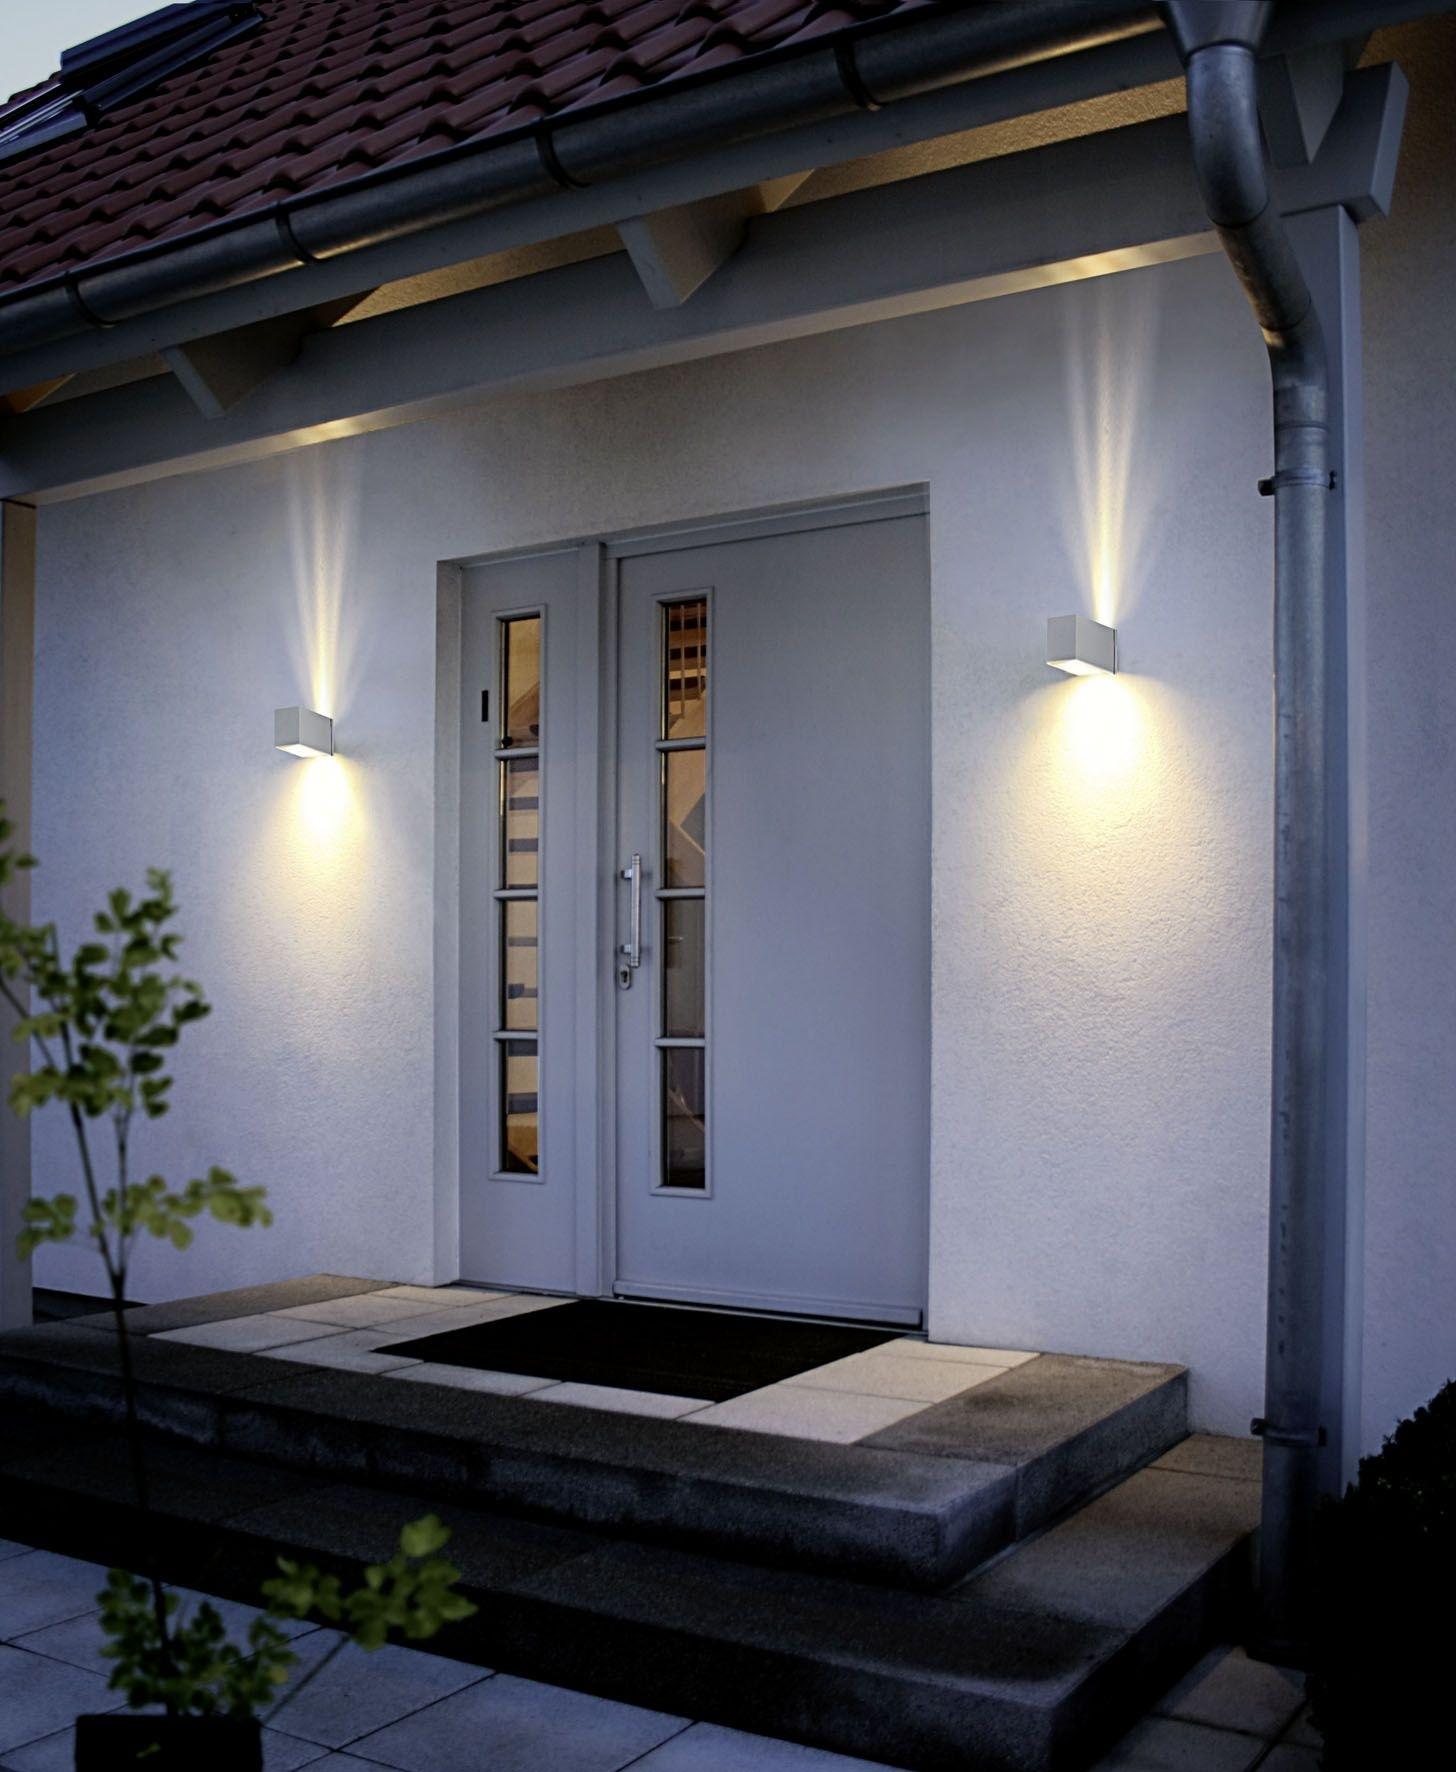 Eglo Outdoor Lighting / Wall Light / Tabo / Silver Finish | Jd ♥s Within Eglo Outdoor Lighting (View 3 of 15)